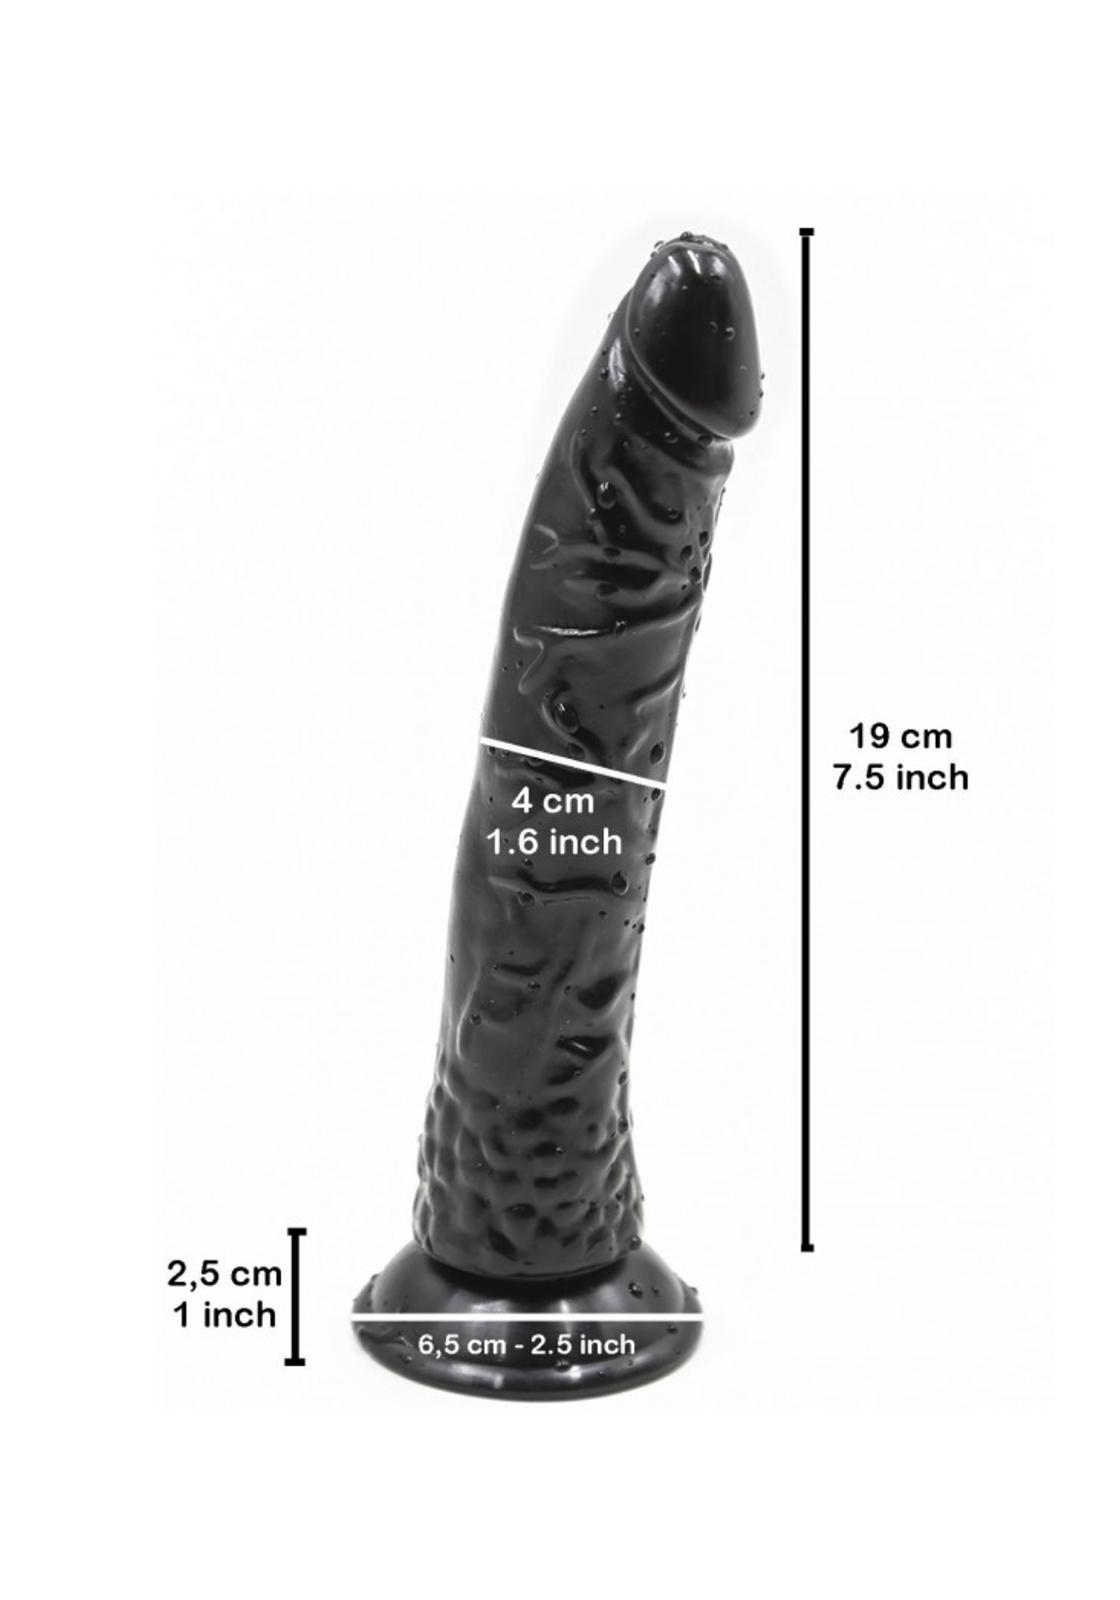 Rude Rider: Long Black Rider Dildo 19 x 4 cm